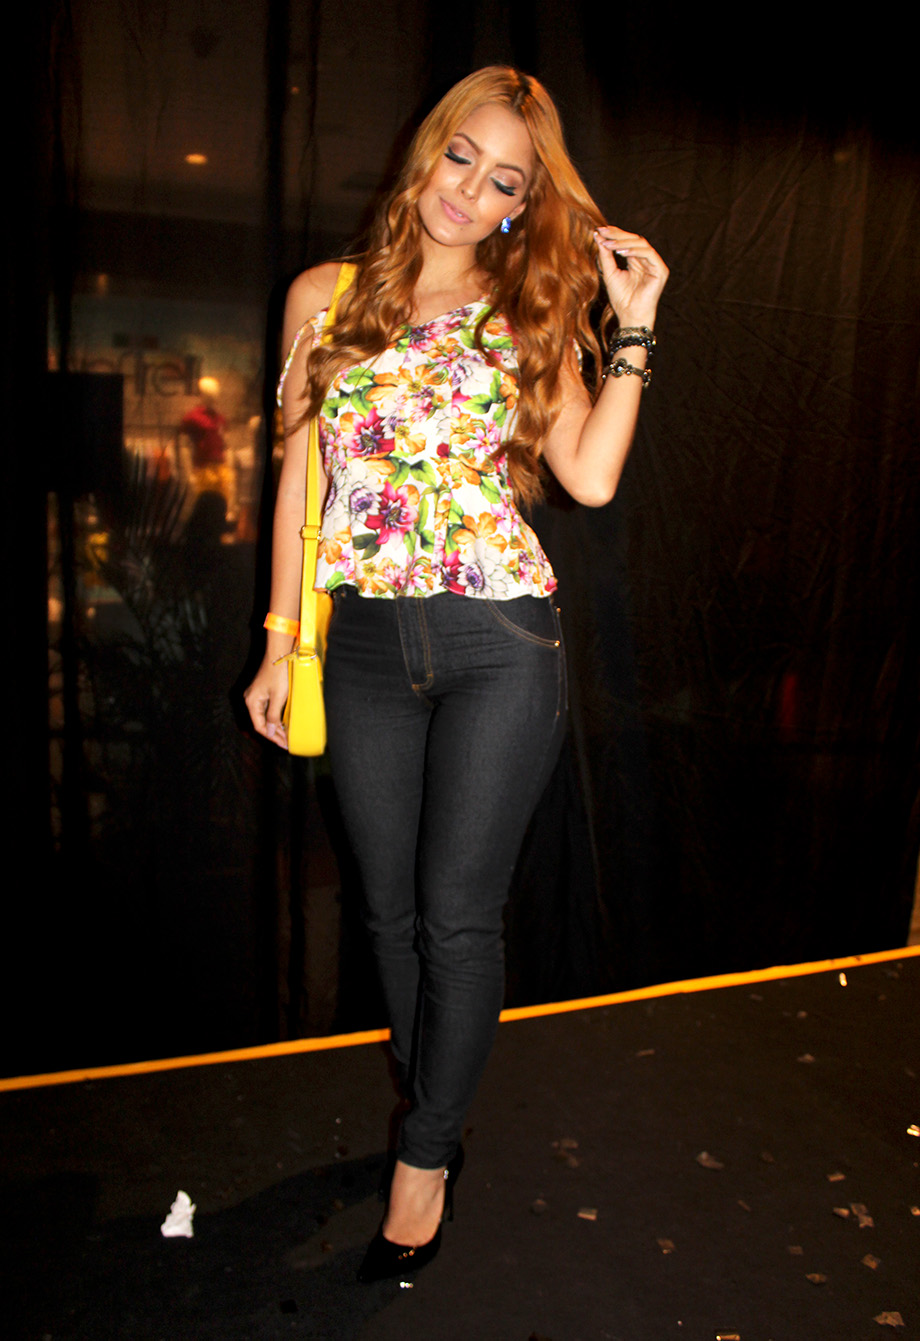 Blog Cris Moreira - Miss Fortaleza 2016 - 2